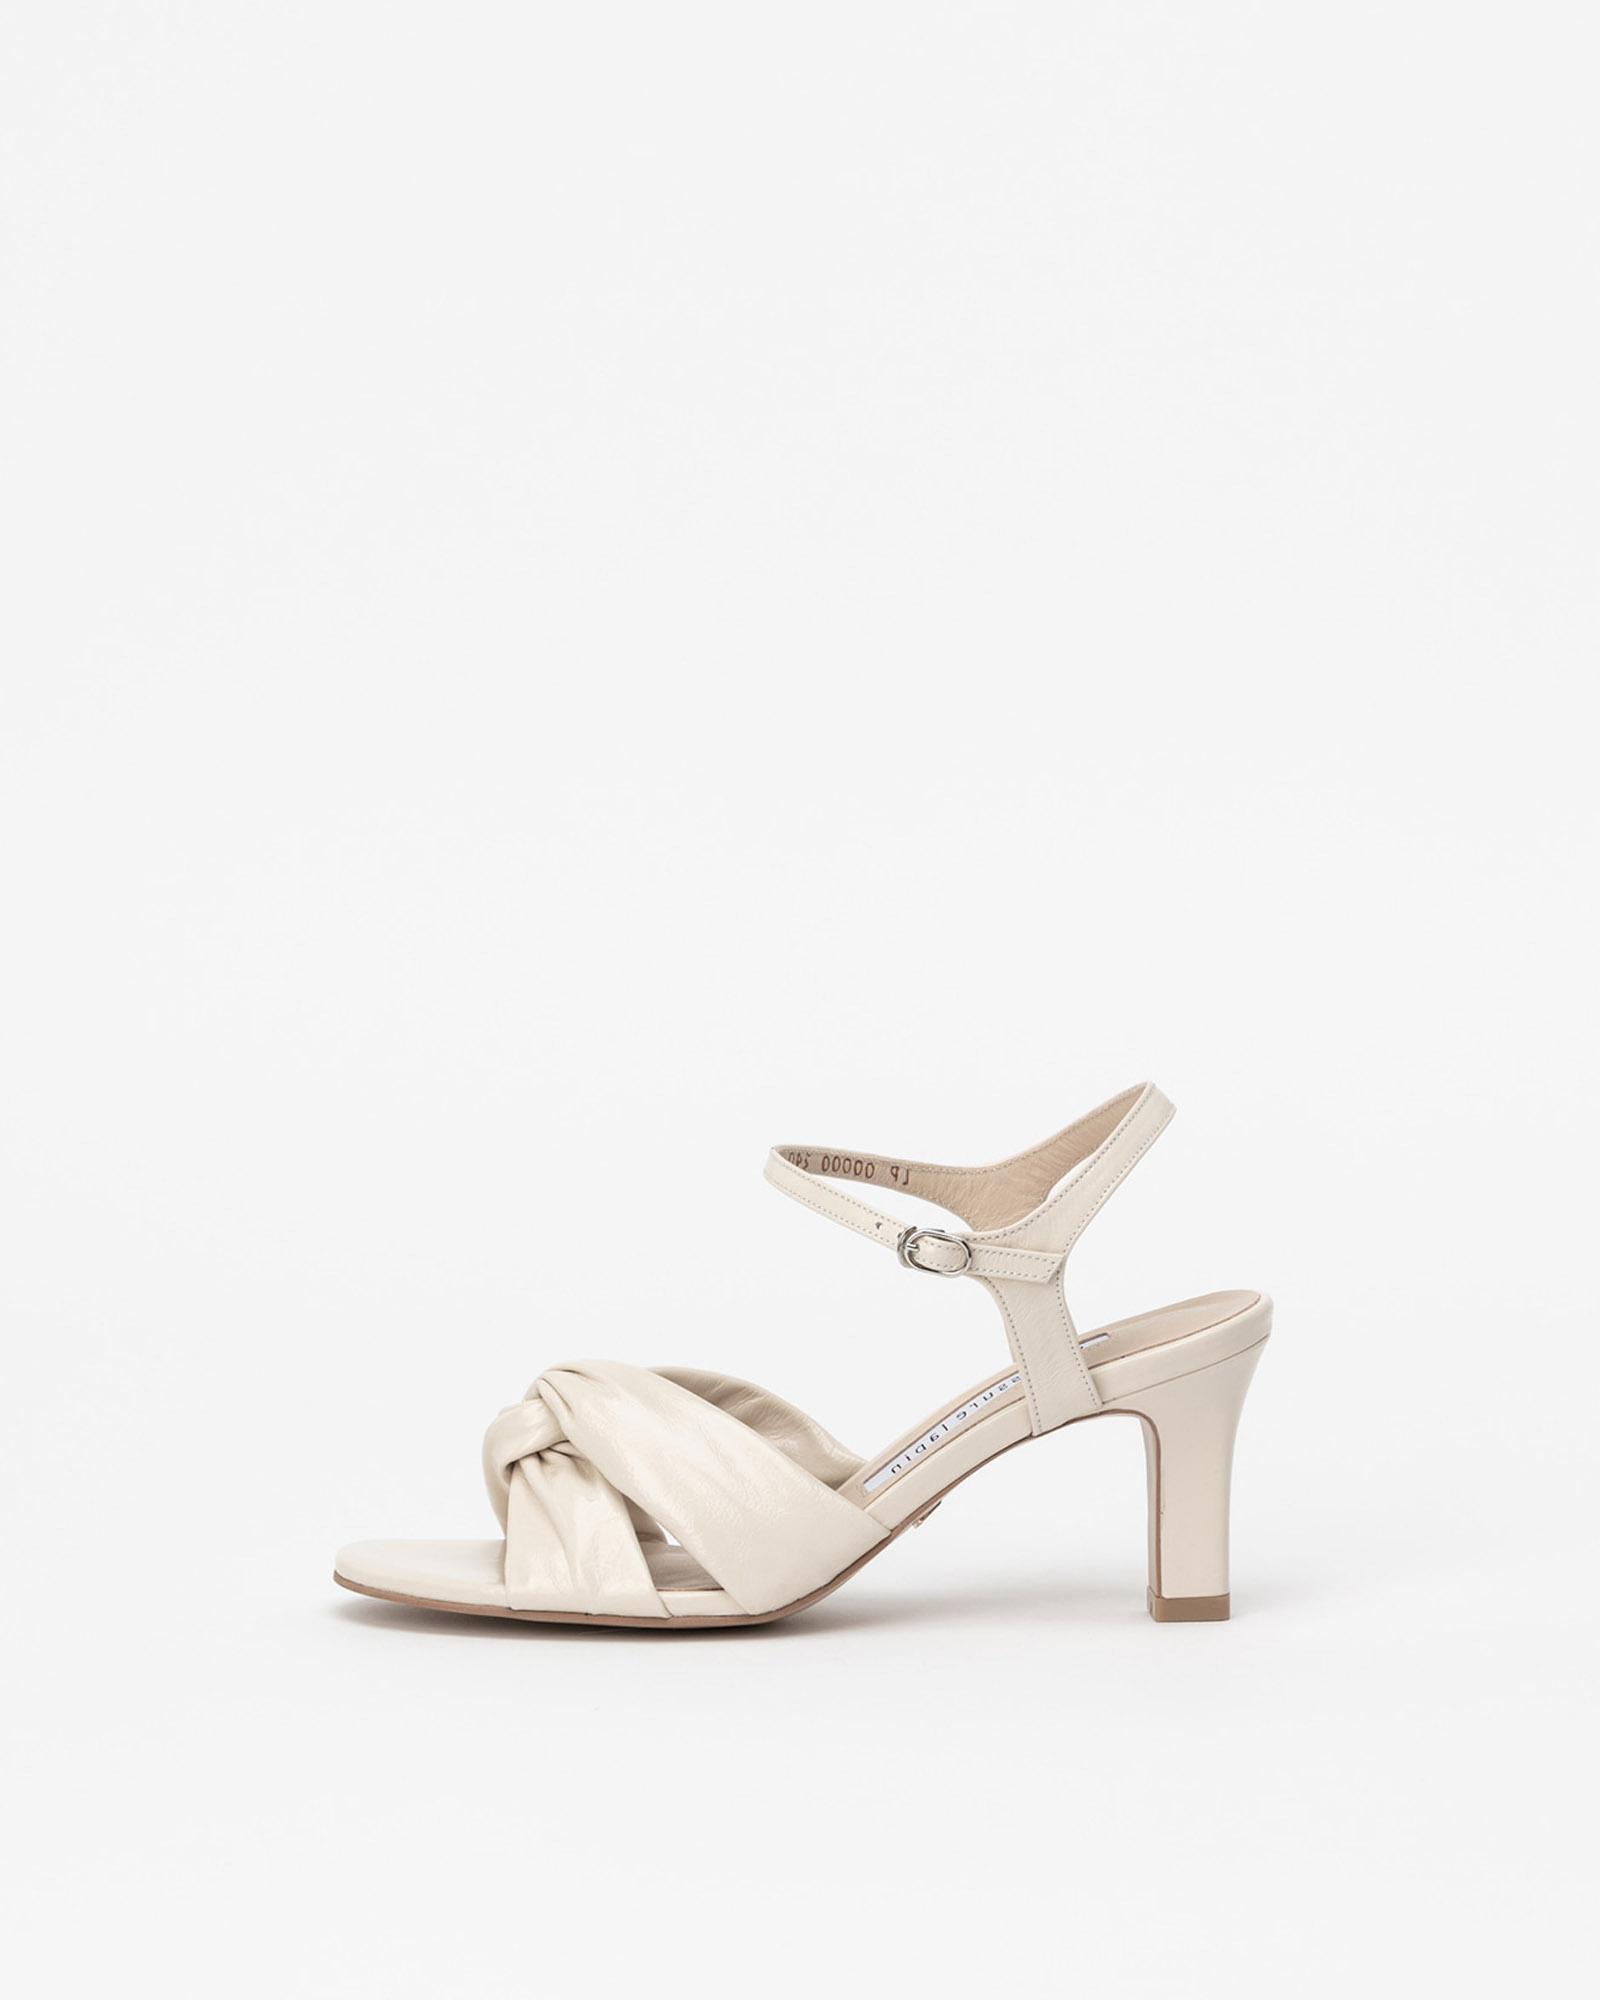 Blisse Sandals in Wrinkled Ivory